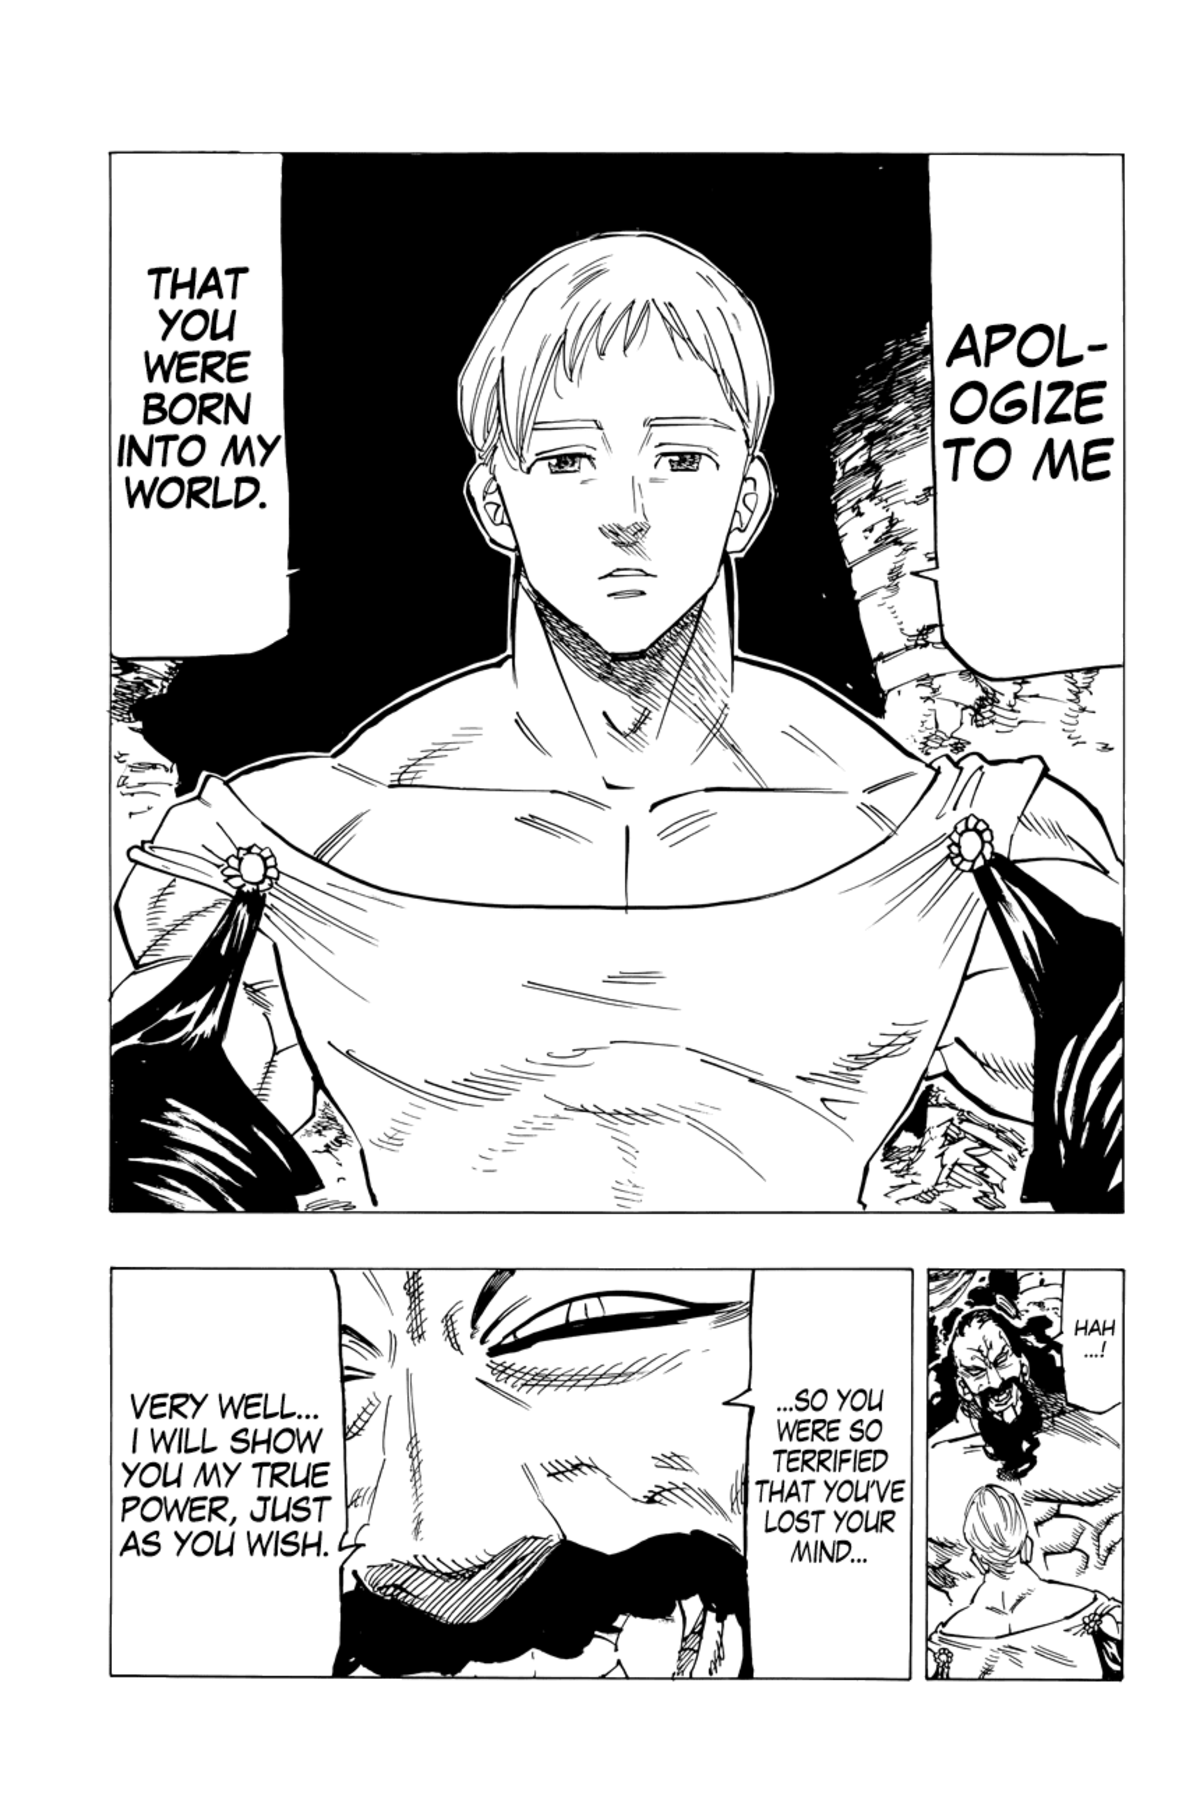 The Darkness feared me. Manga: Nanatsu no Taizai. SHOW ' you MY TRUE I POWER, JUST AS You WISH.mama! ms TH IS IS AN EWING EWING I I FOR AHAWA mommy mew-' 55 MEX